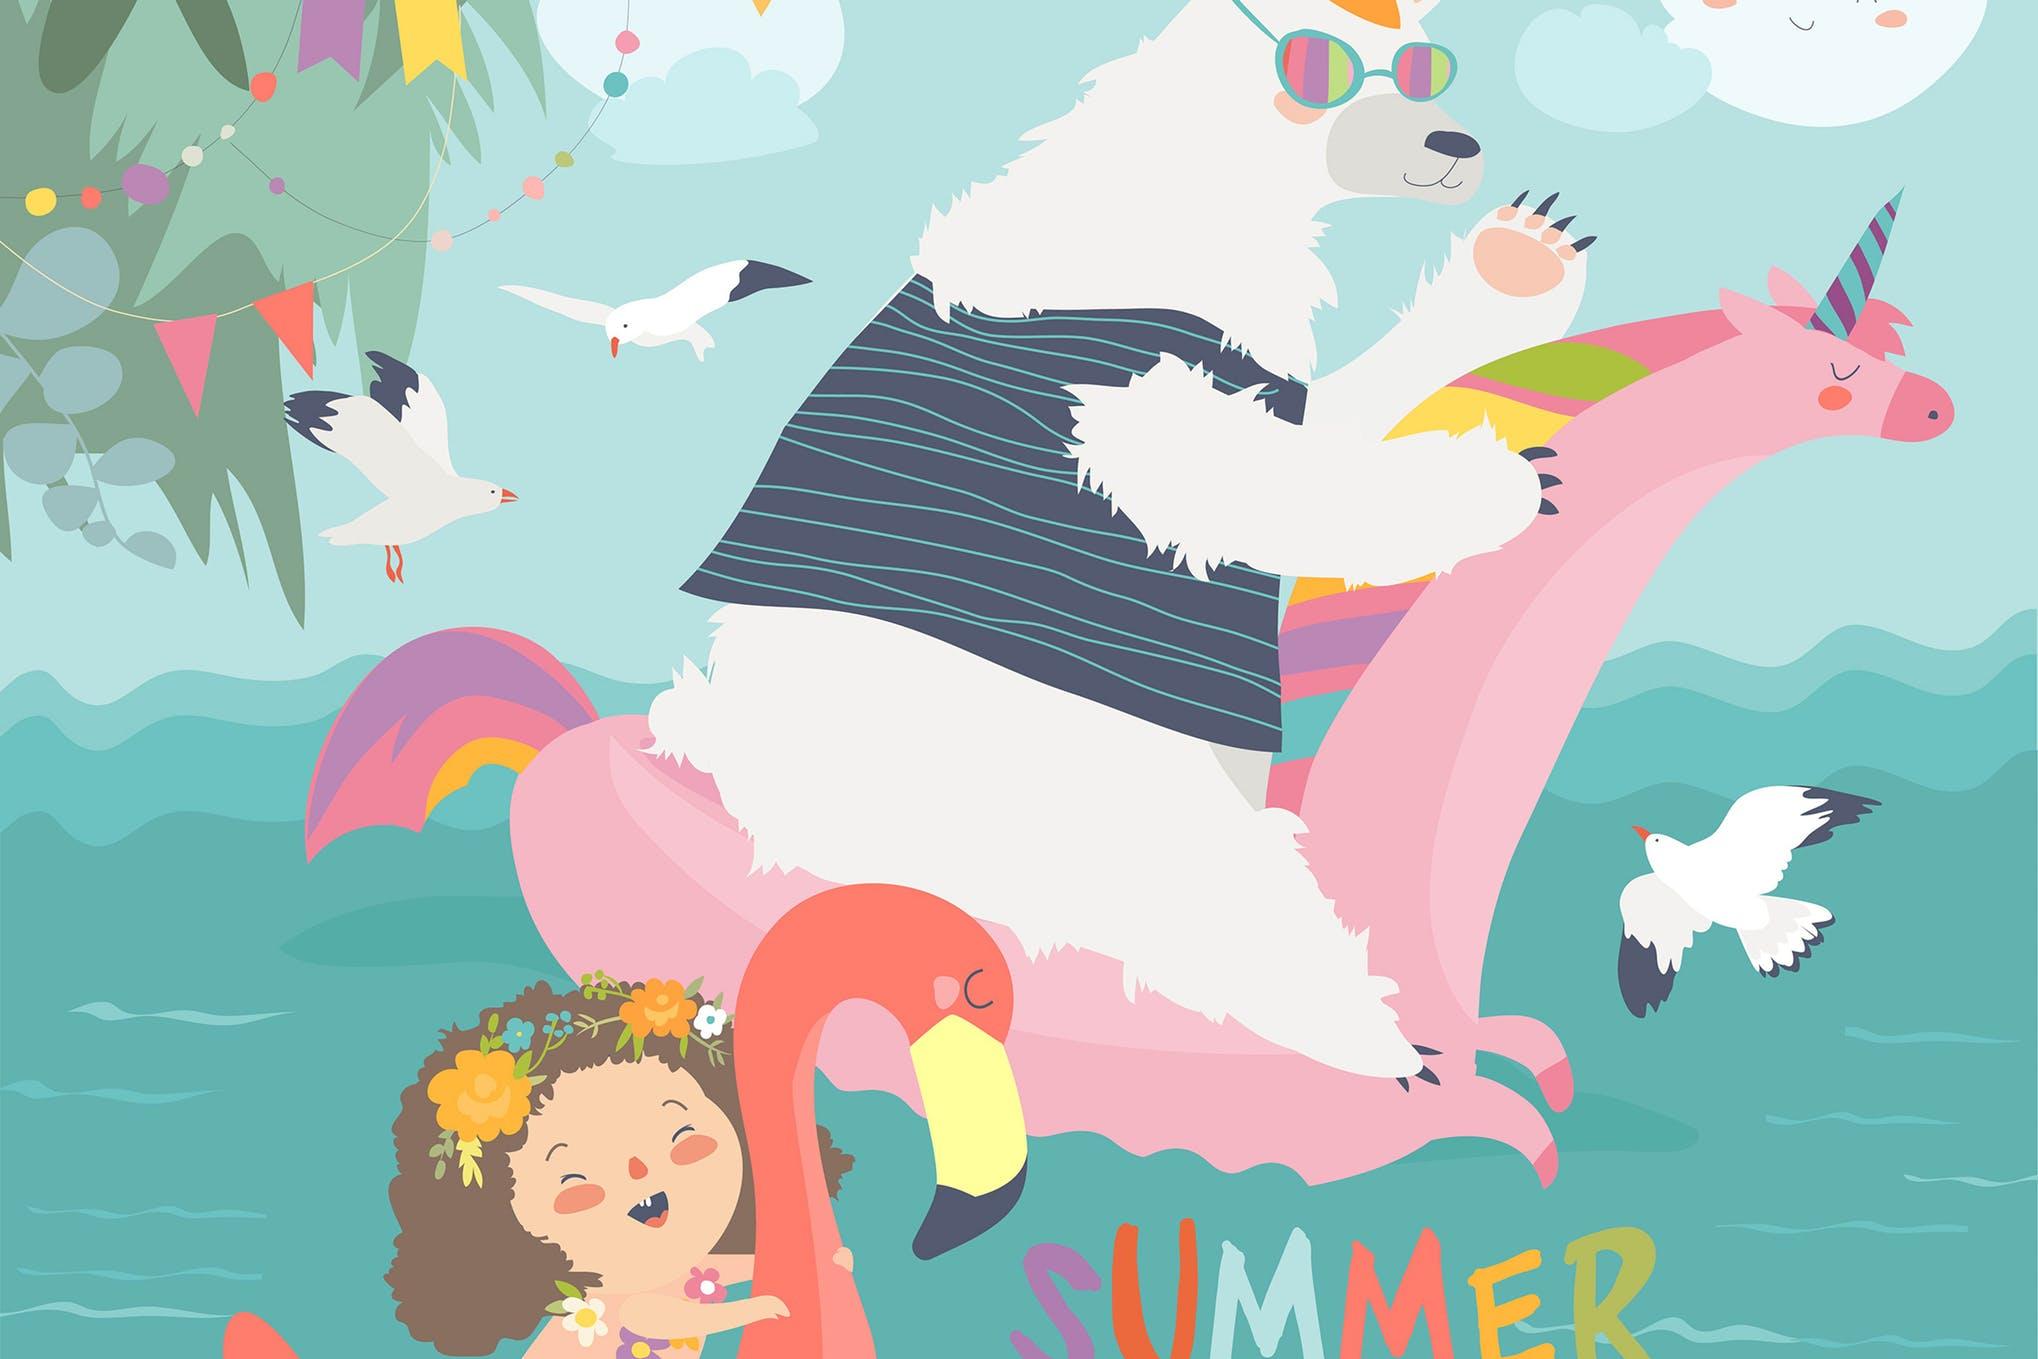 卡通系列插画素材下载Cute girls and polar bear with a swimming circles.